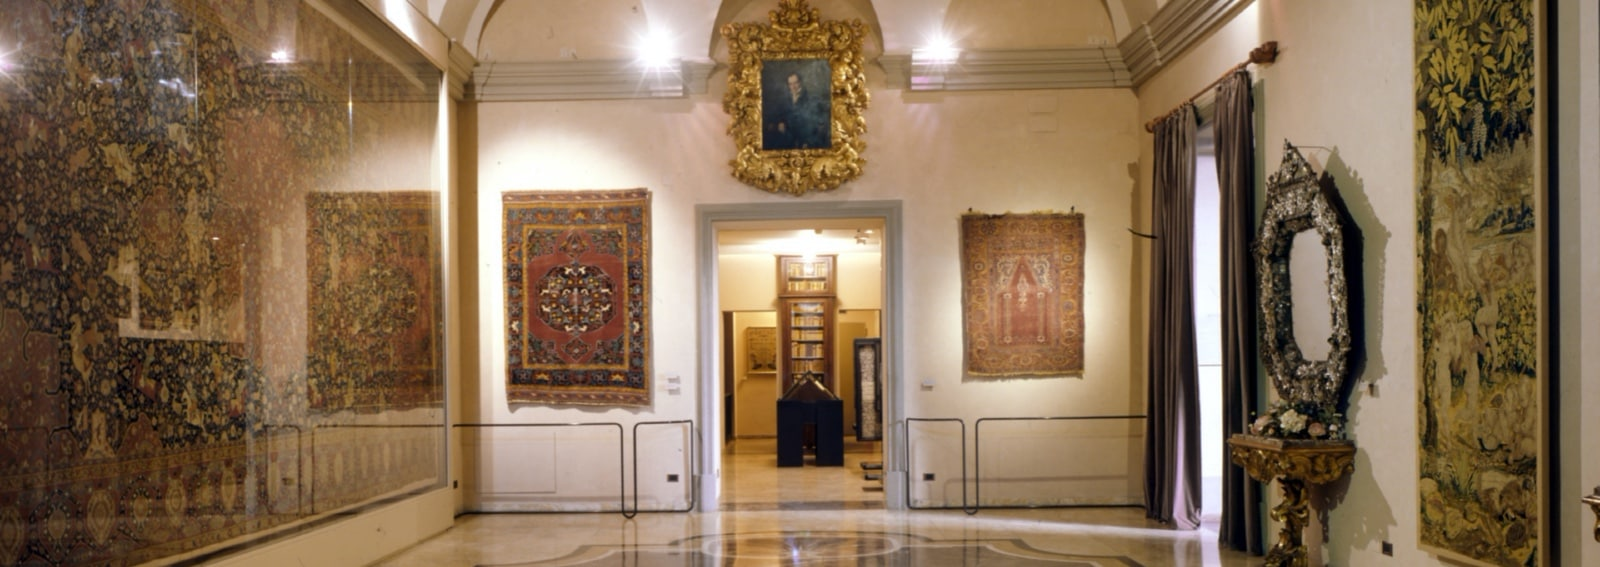 Salone Affresco Museo Poldi Pezzoli